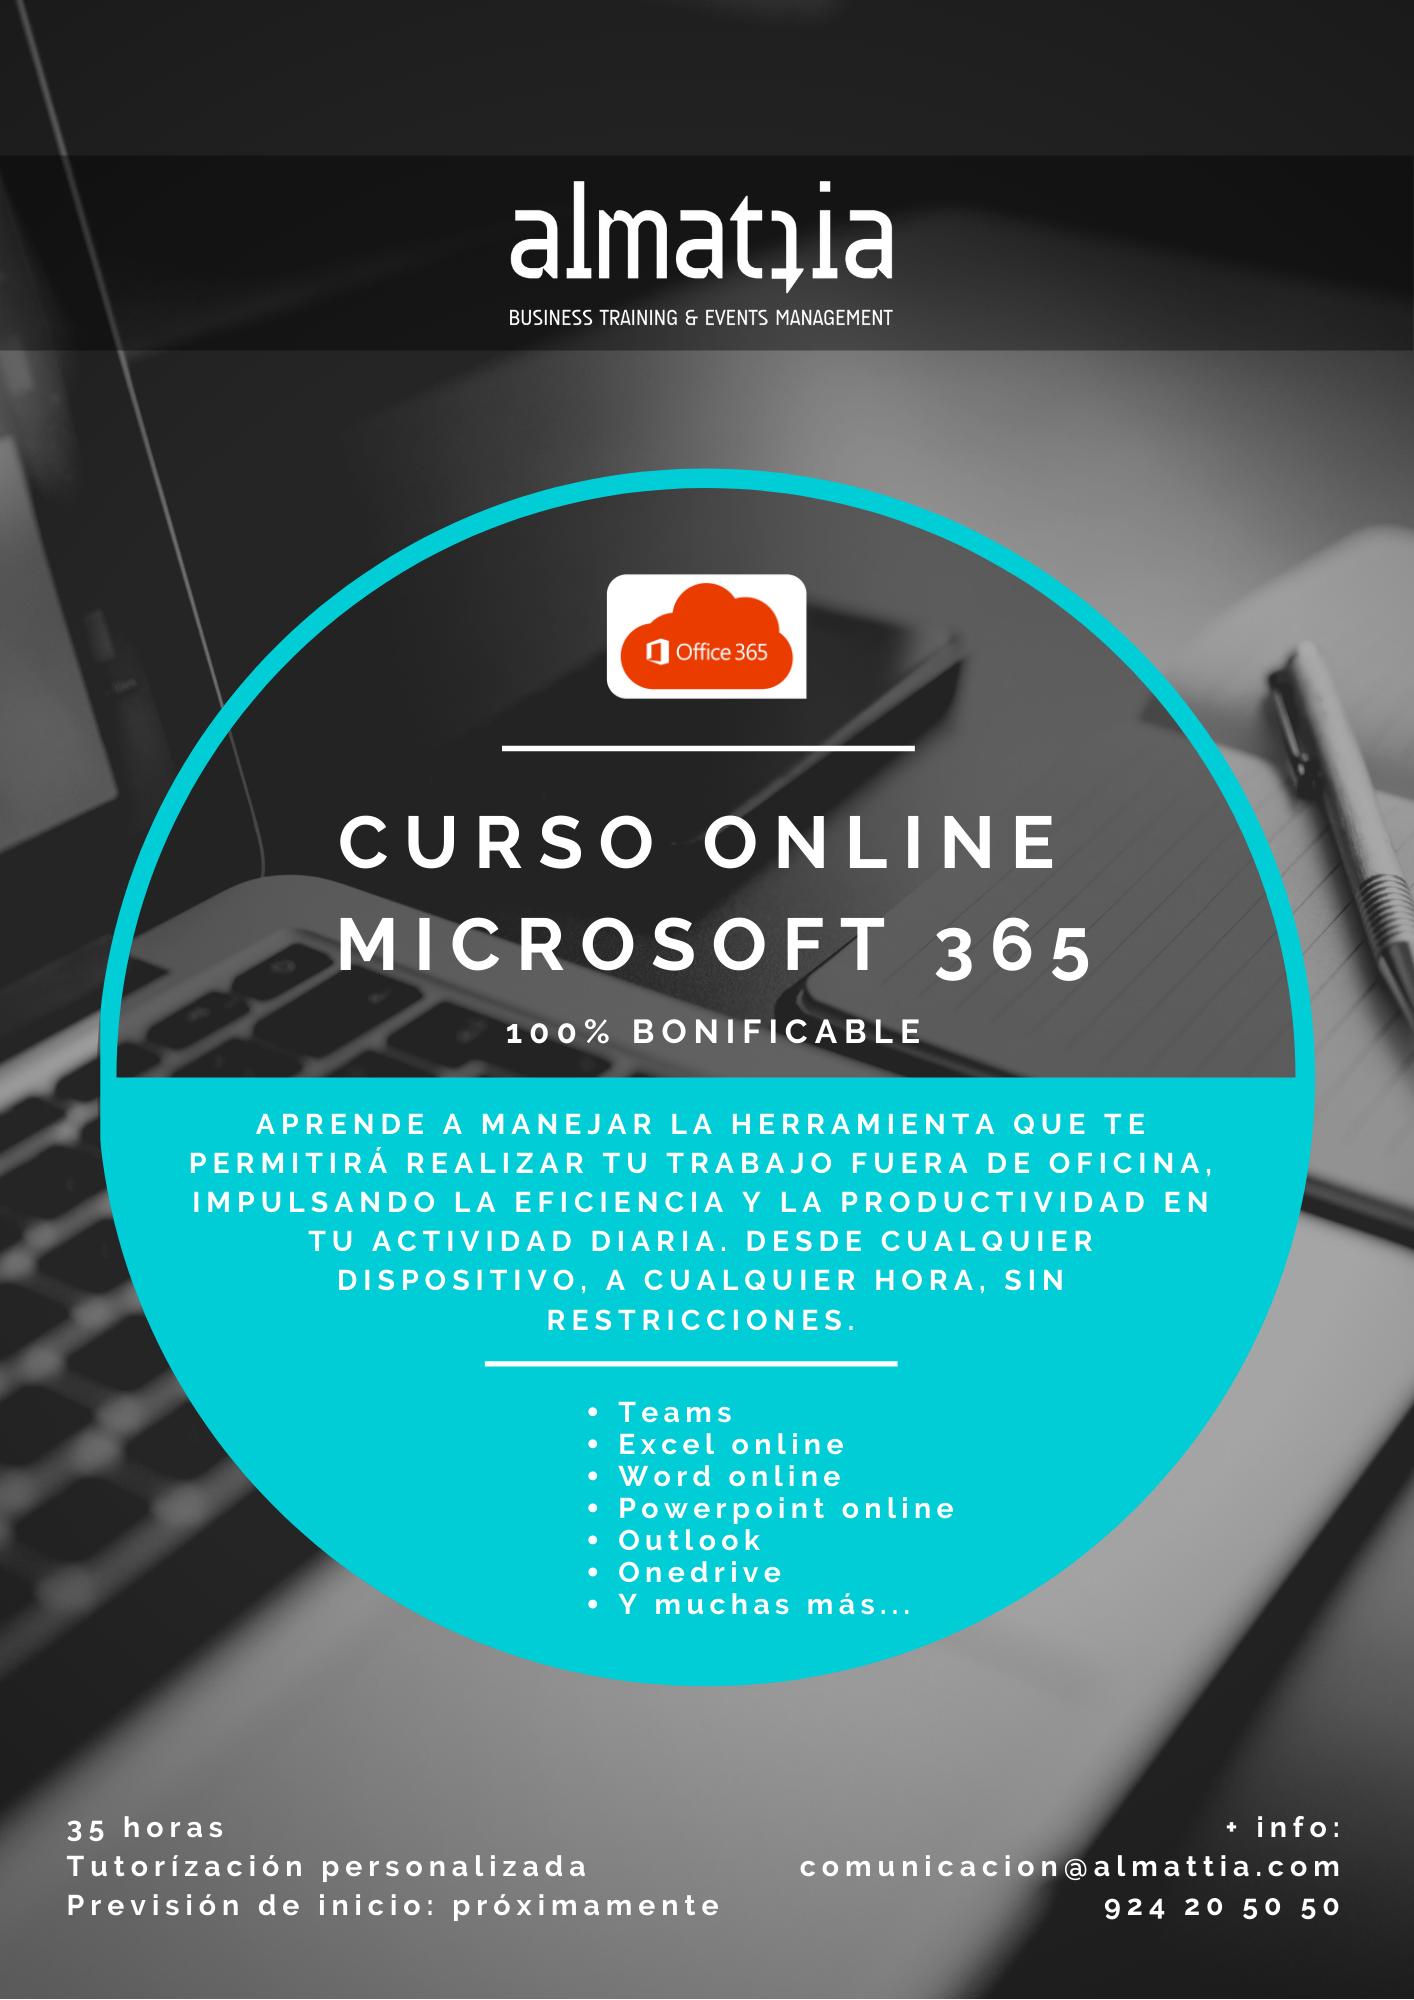 CURSO ONLINE DE MICROSOFT 365